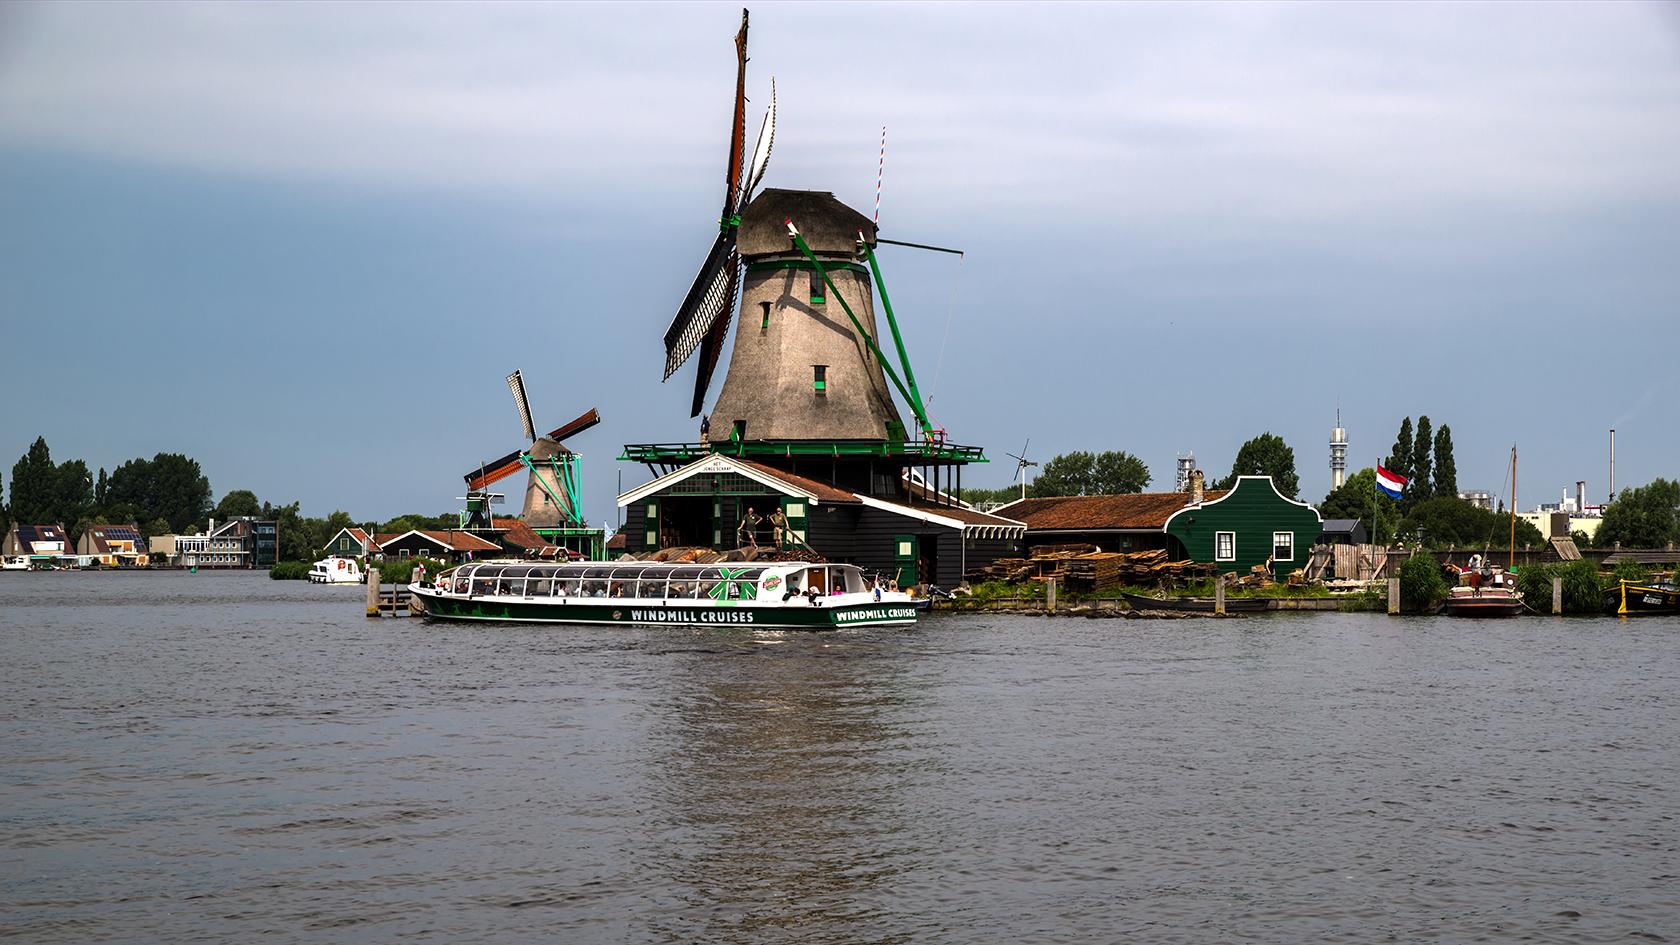 Windmill Cruises